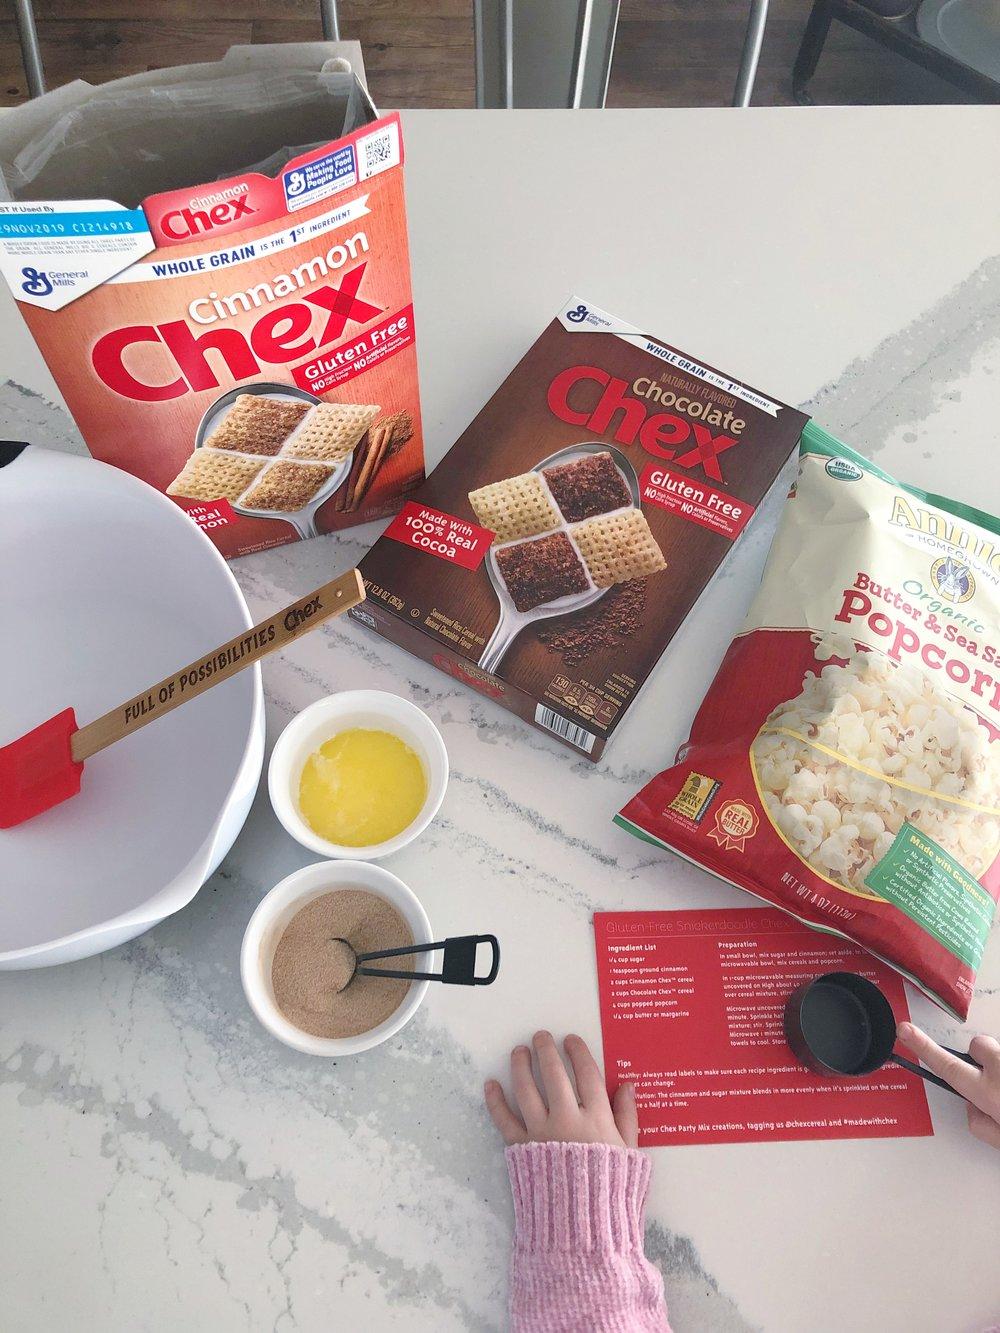 chex-recipe-card-ingredients.JPG